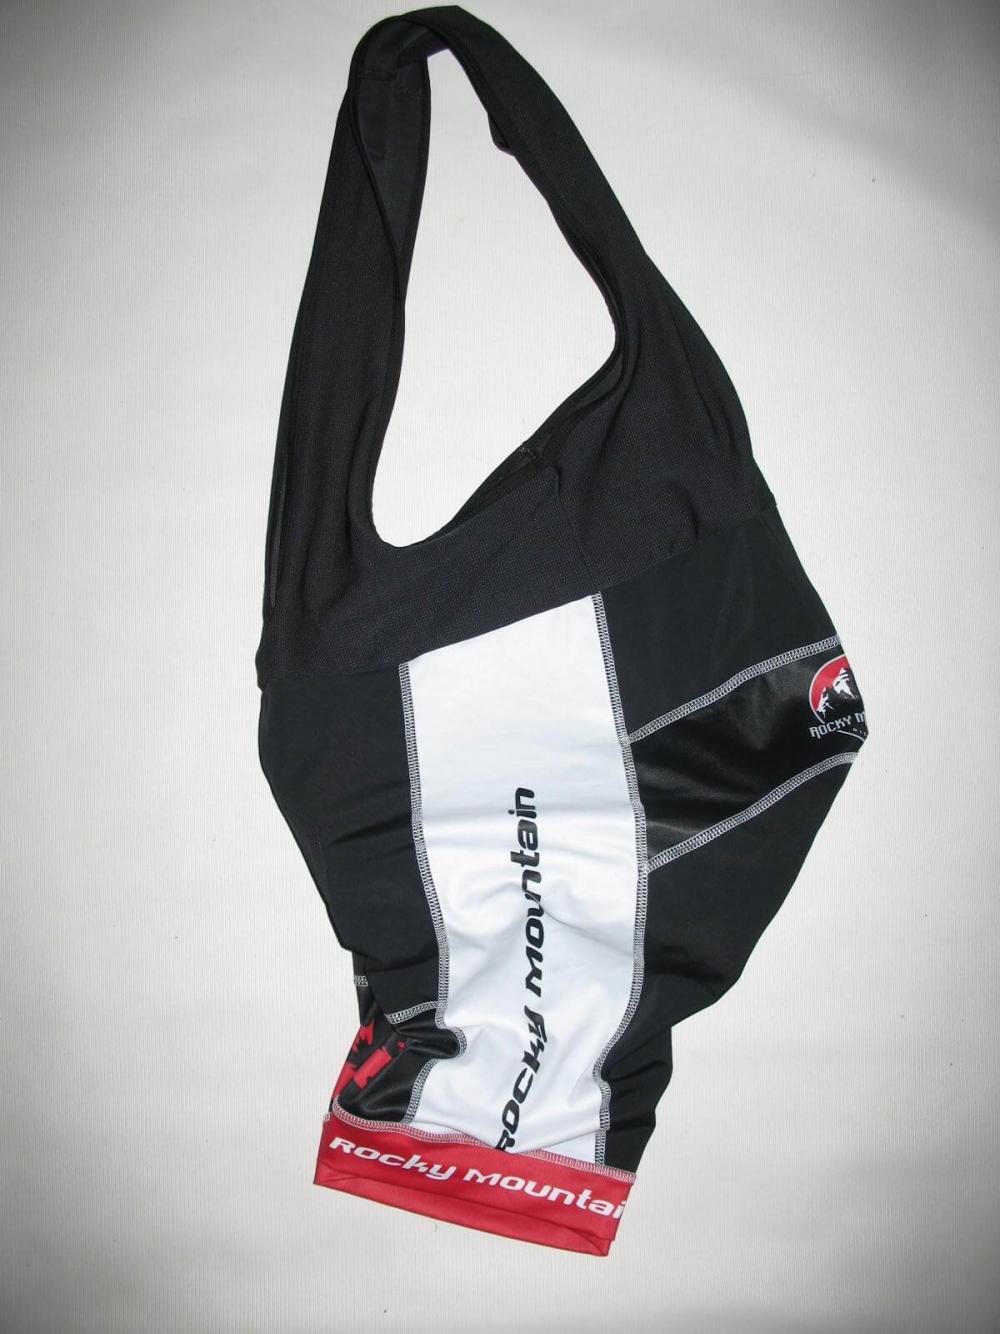 Велошорты CUORE rocky mountain bib shorts (размер M) - 1